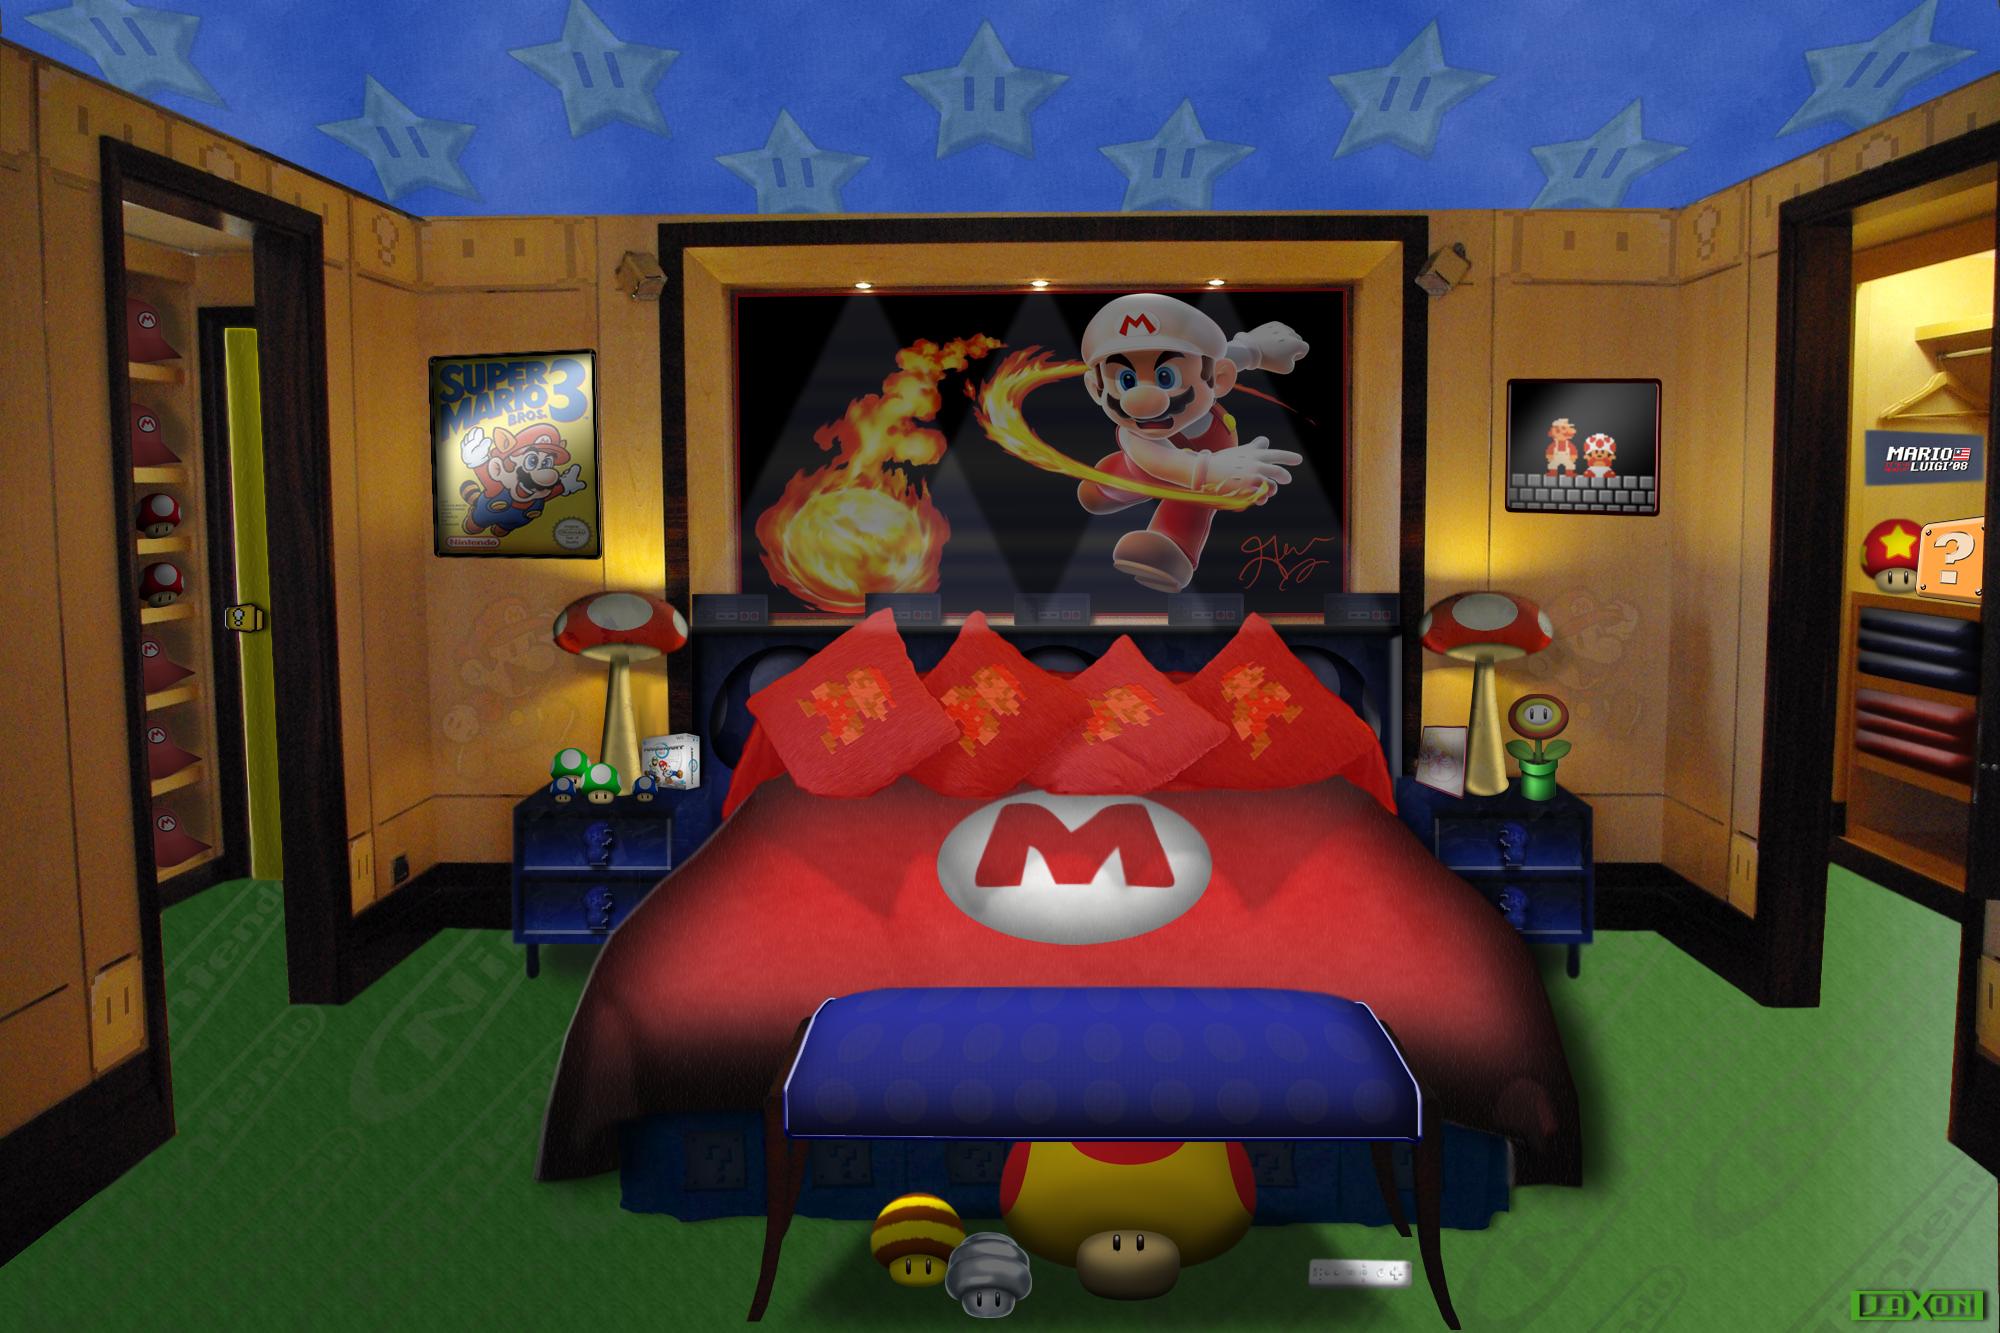 mario 39 s bedroom by jayjaxon on deviantart